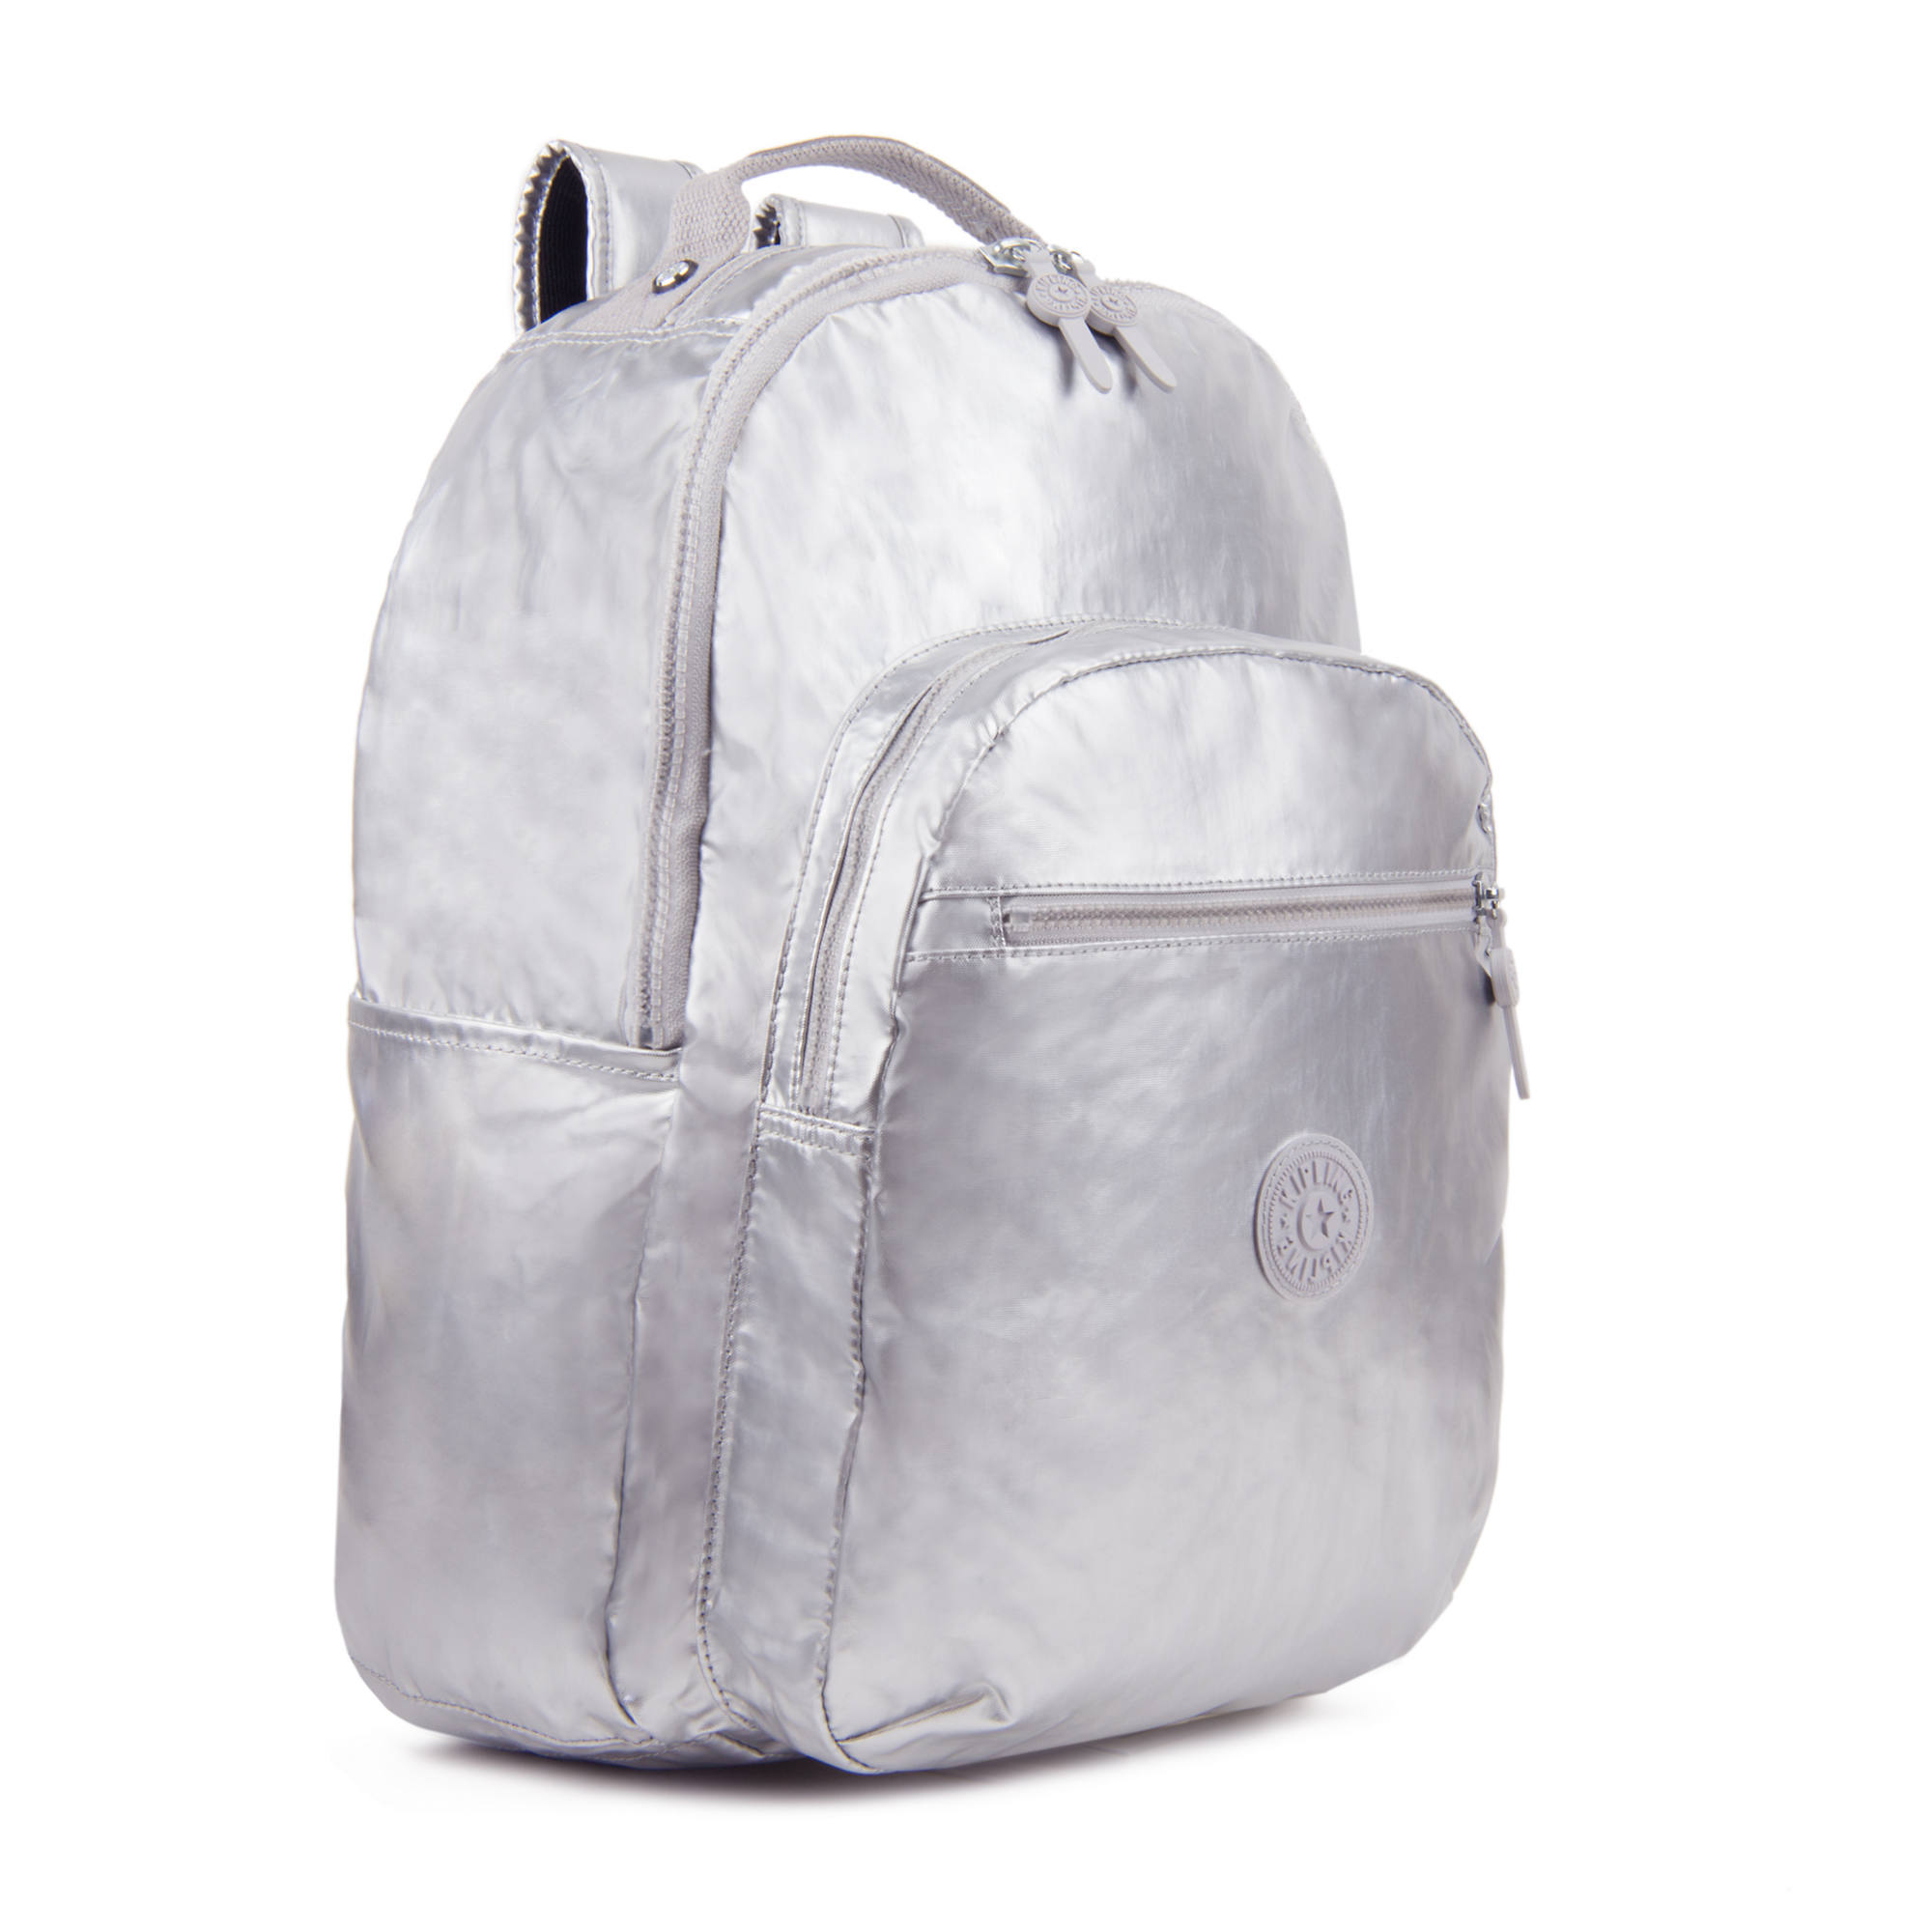 4521db8a47 Seoul Large Metallic Laptop Backpack